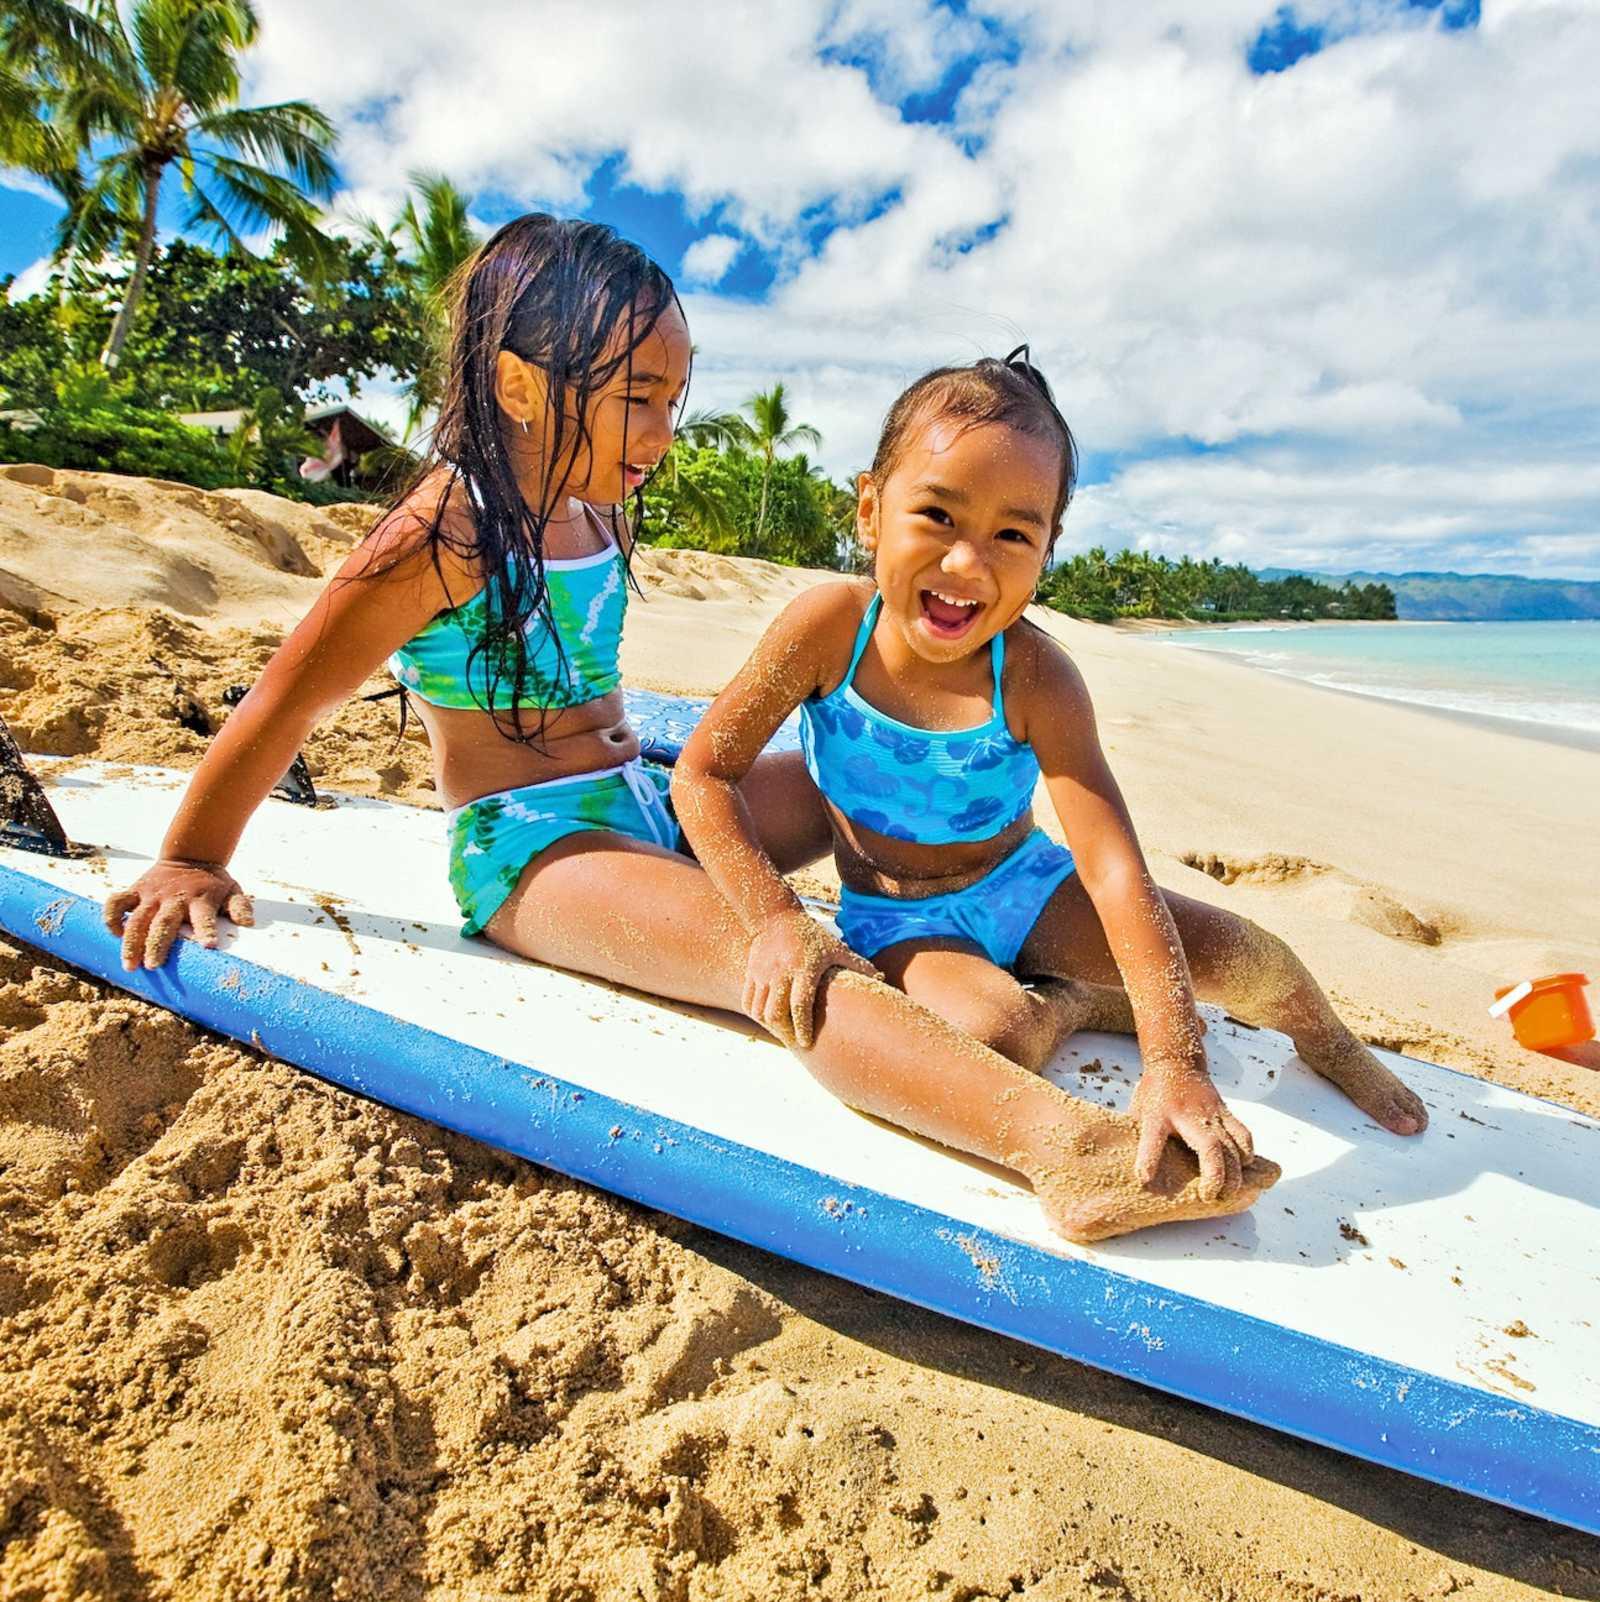 Strandvergnügen auf Kauai